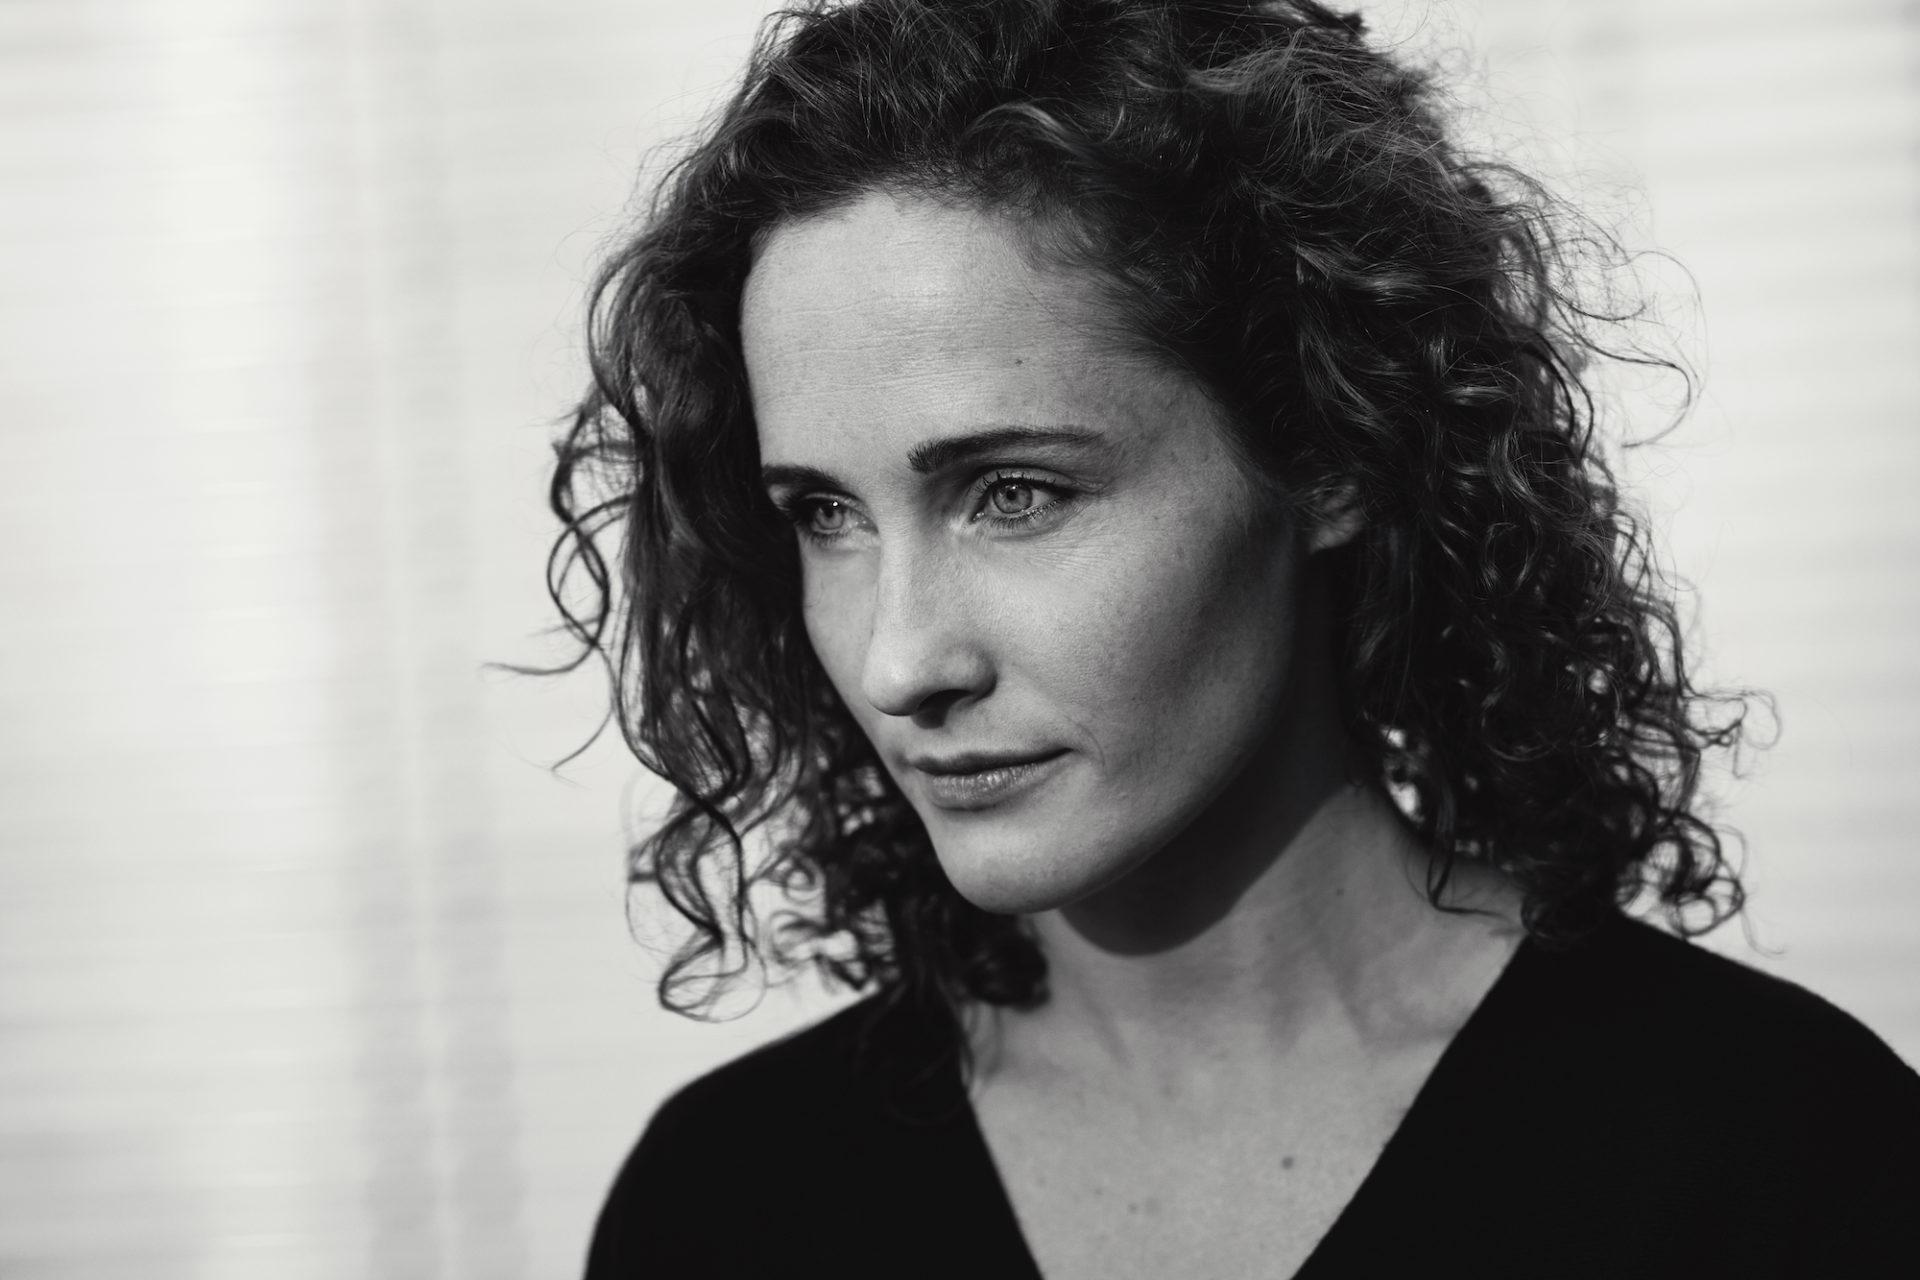 Marie Ulbricht